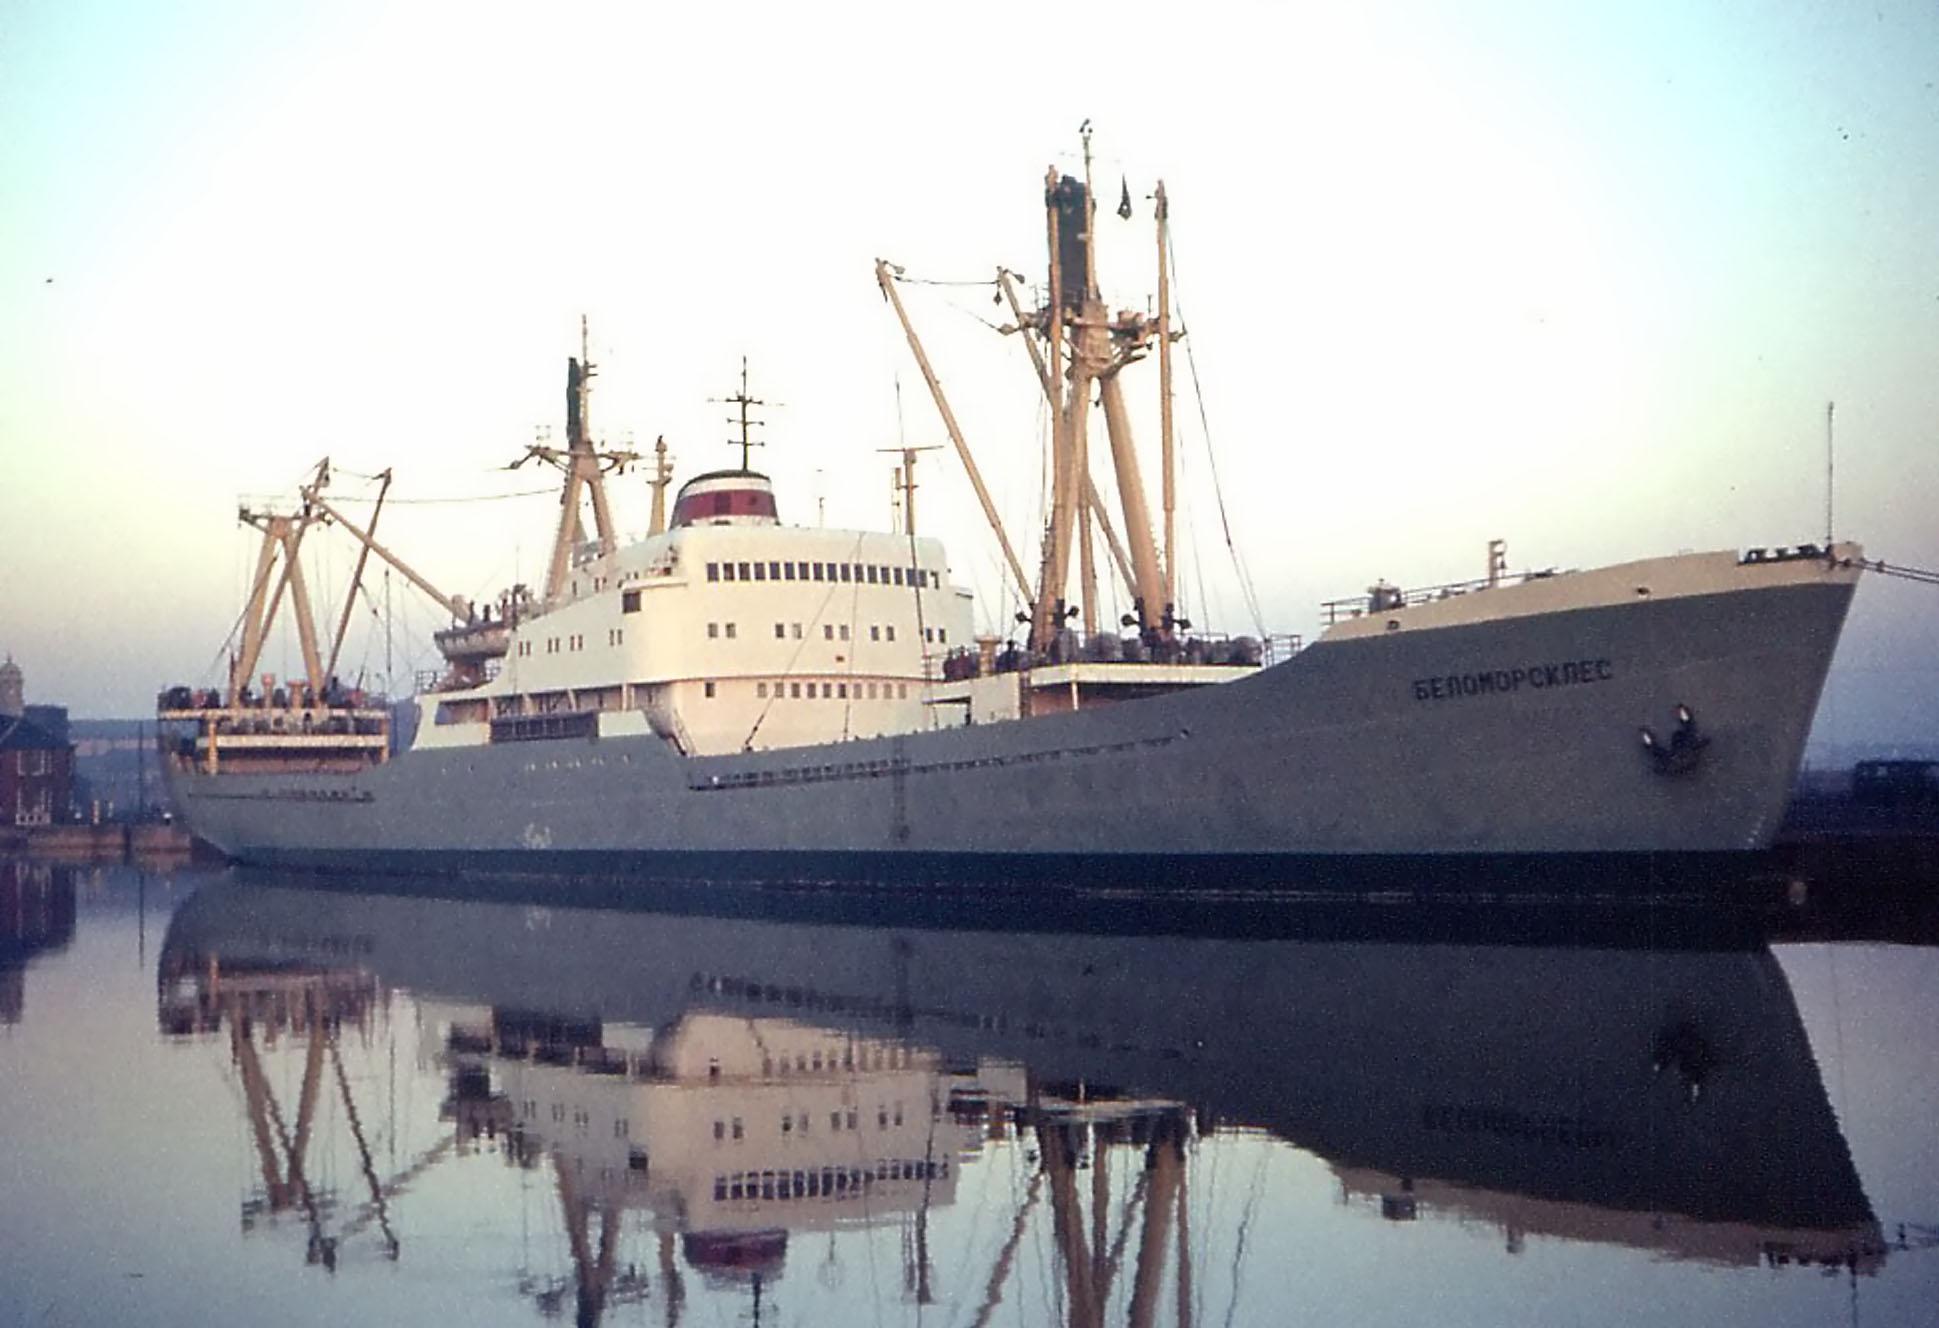 балтийского пароходства фото суда